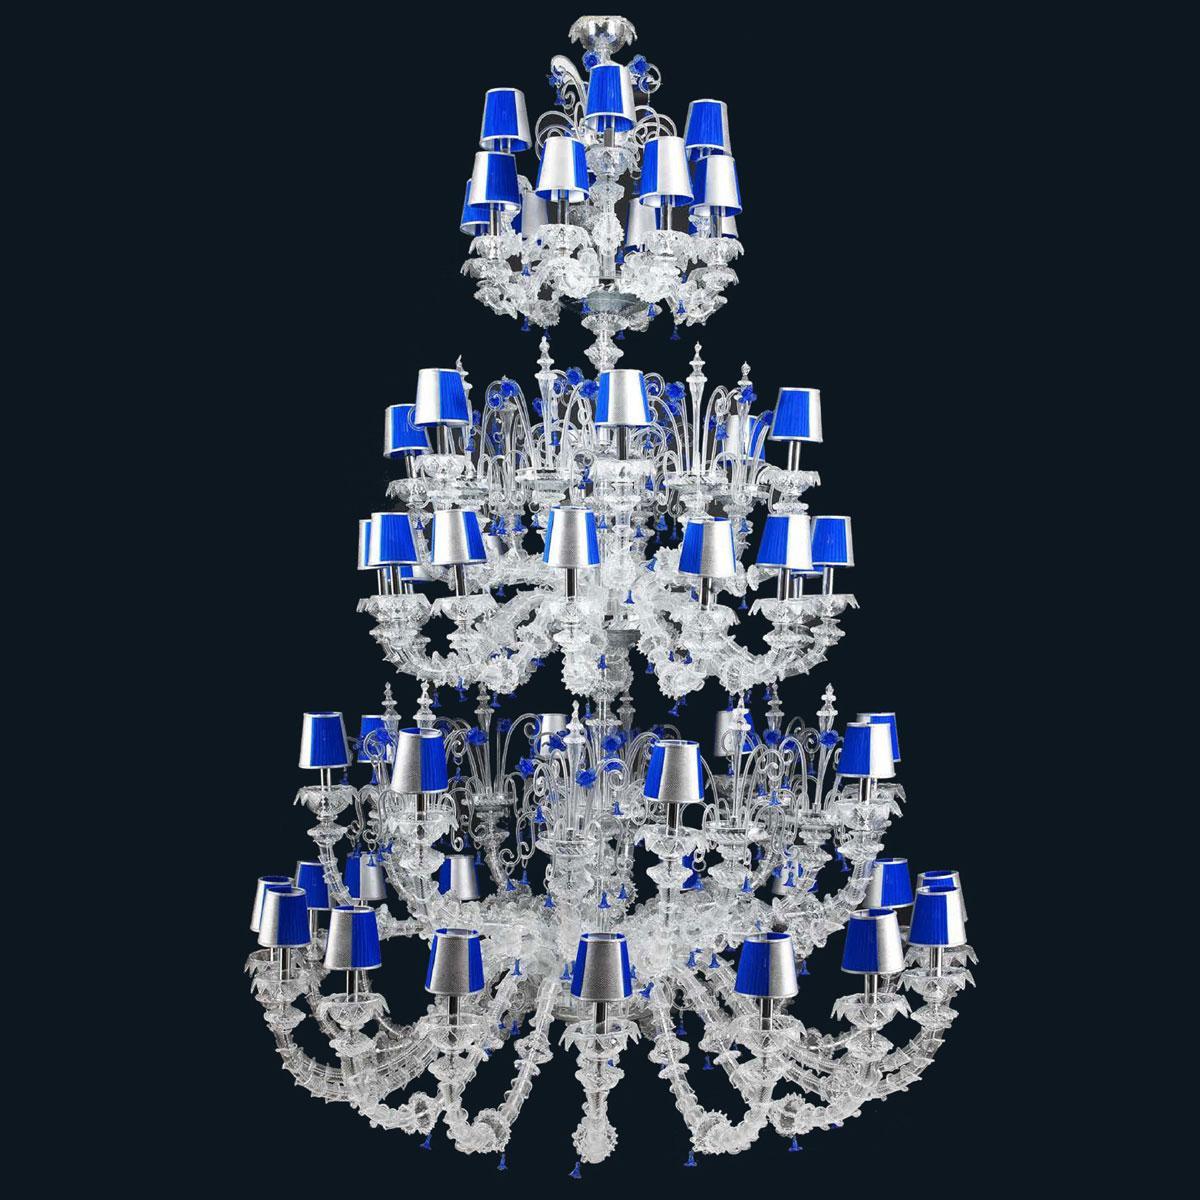 """Julien"" lampara de araña de Murano con pantallas - 16+8+12+6+8+4 luces - transparente y azul"